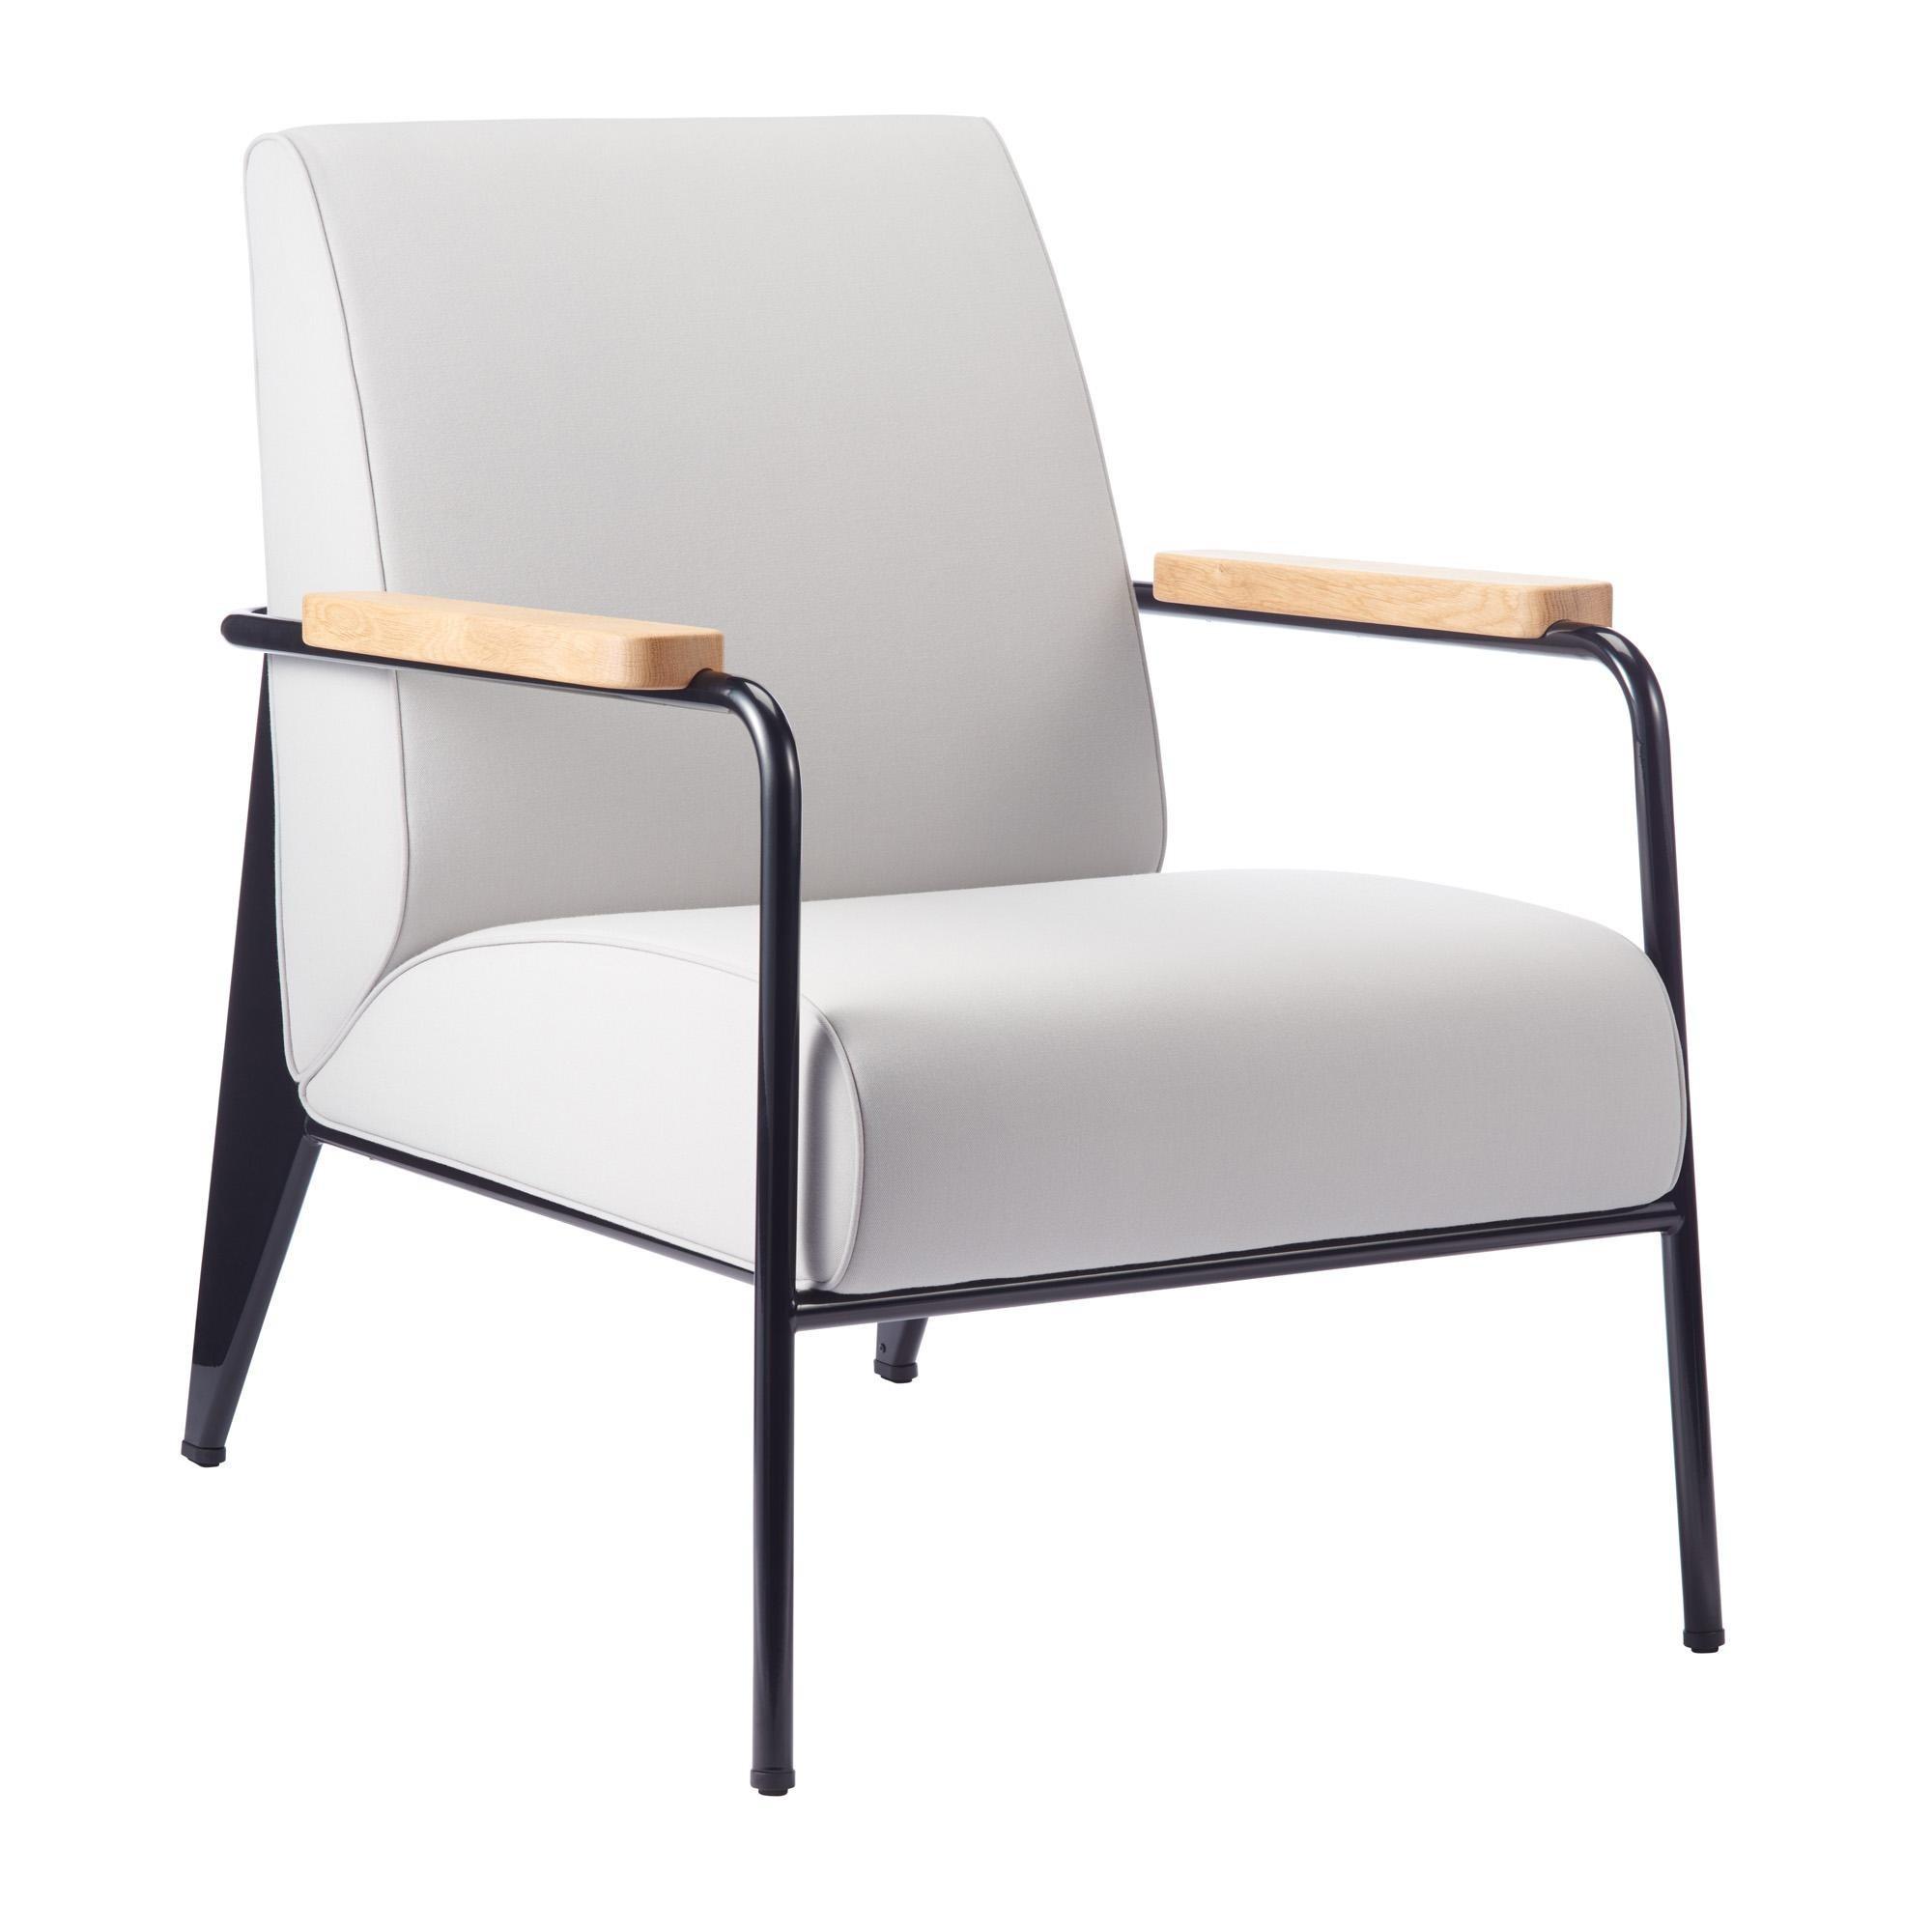 Vitra Fauteuil de Salon Prouvé Armchair | AmbienteDirect - Fauteuil Salon Ikea